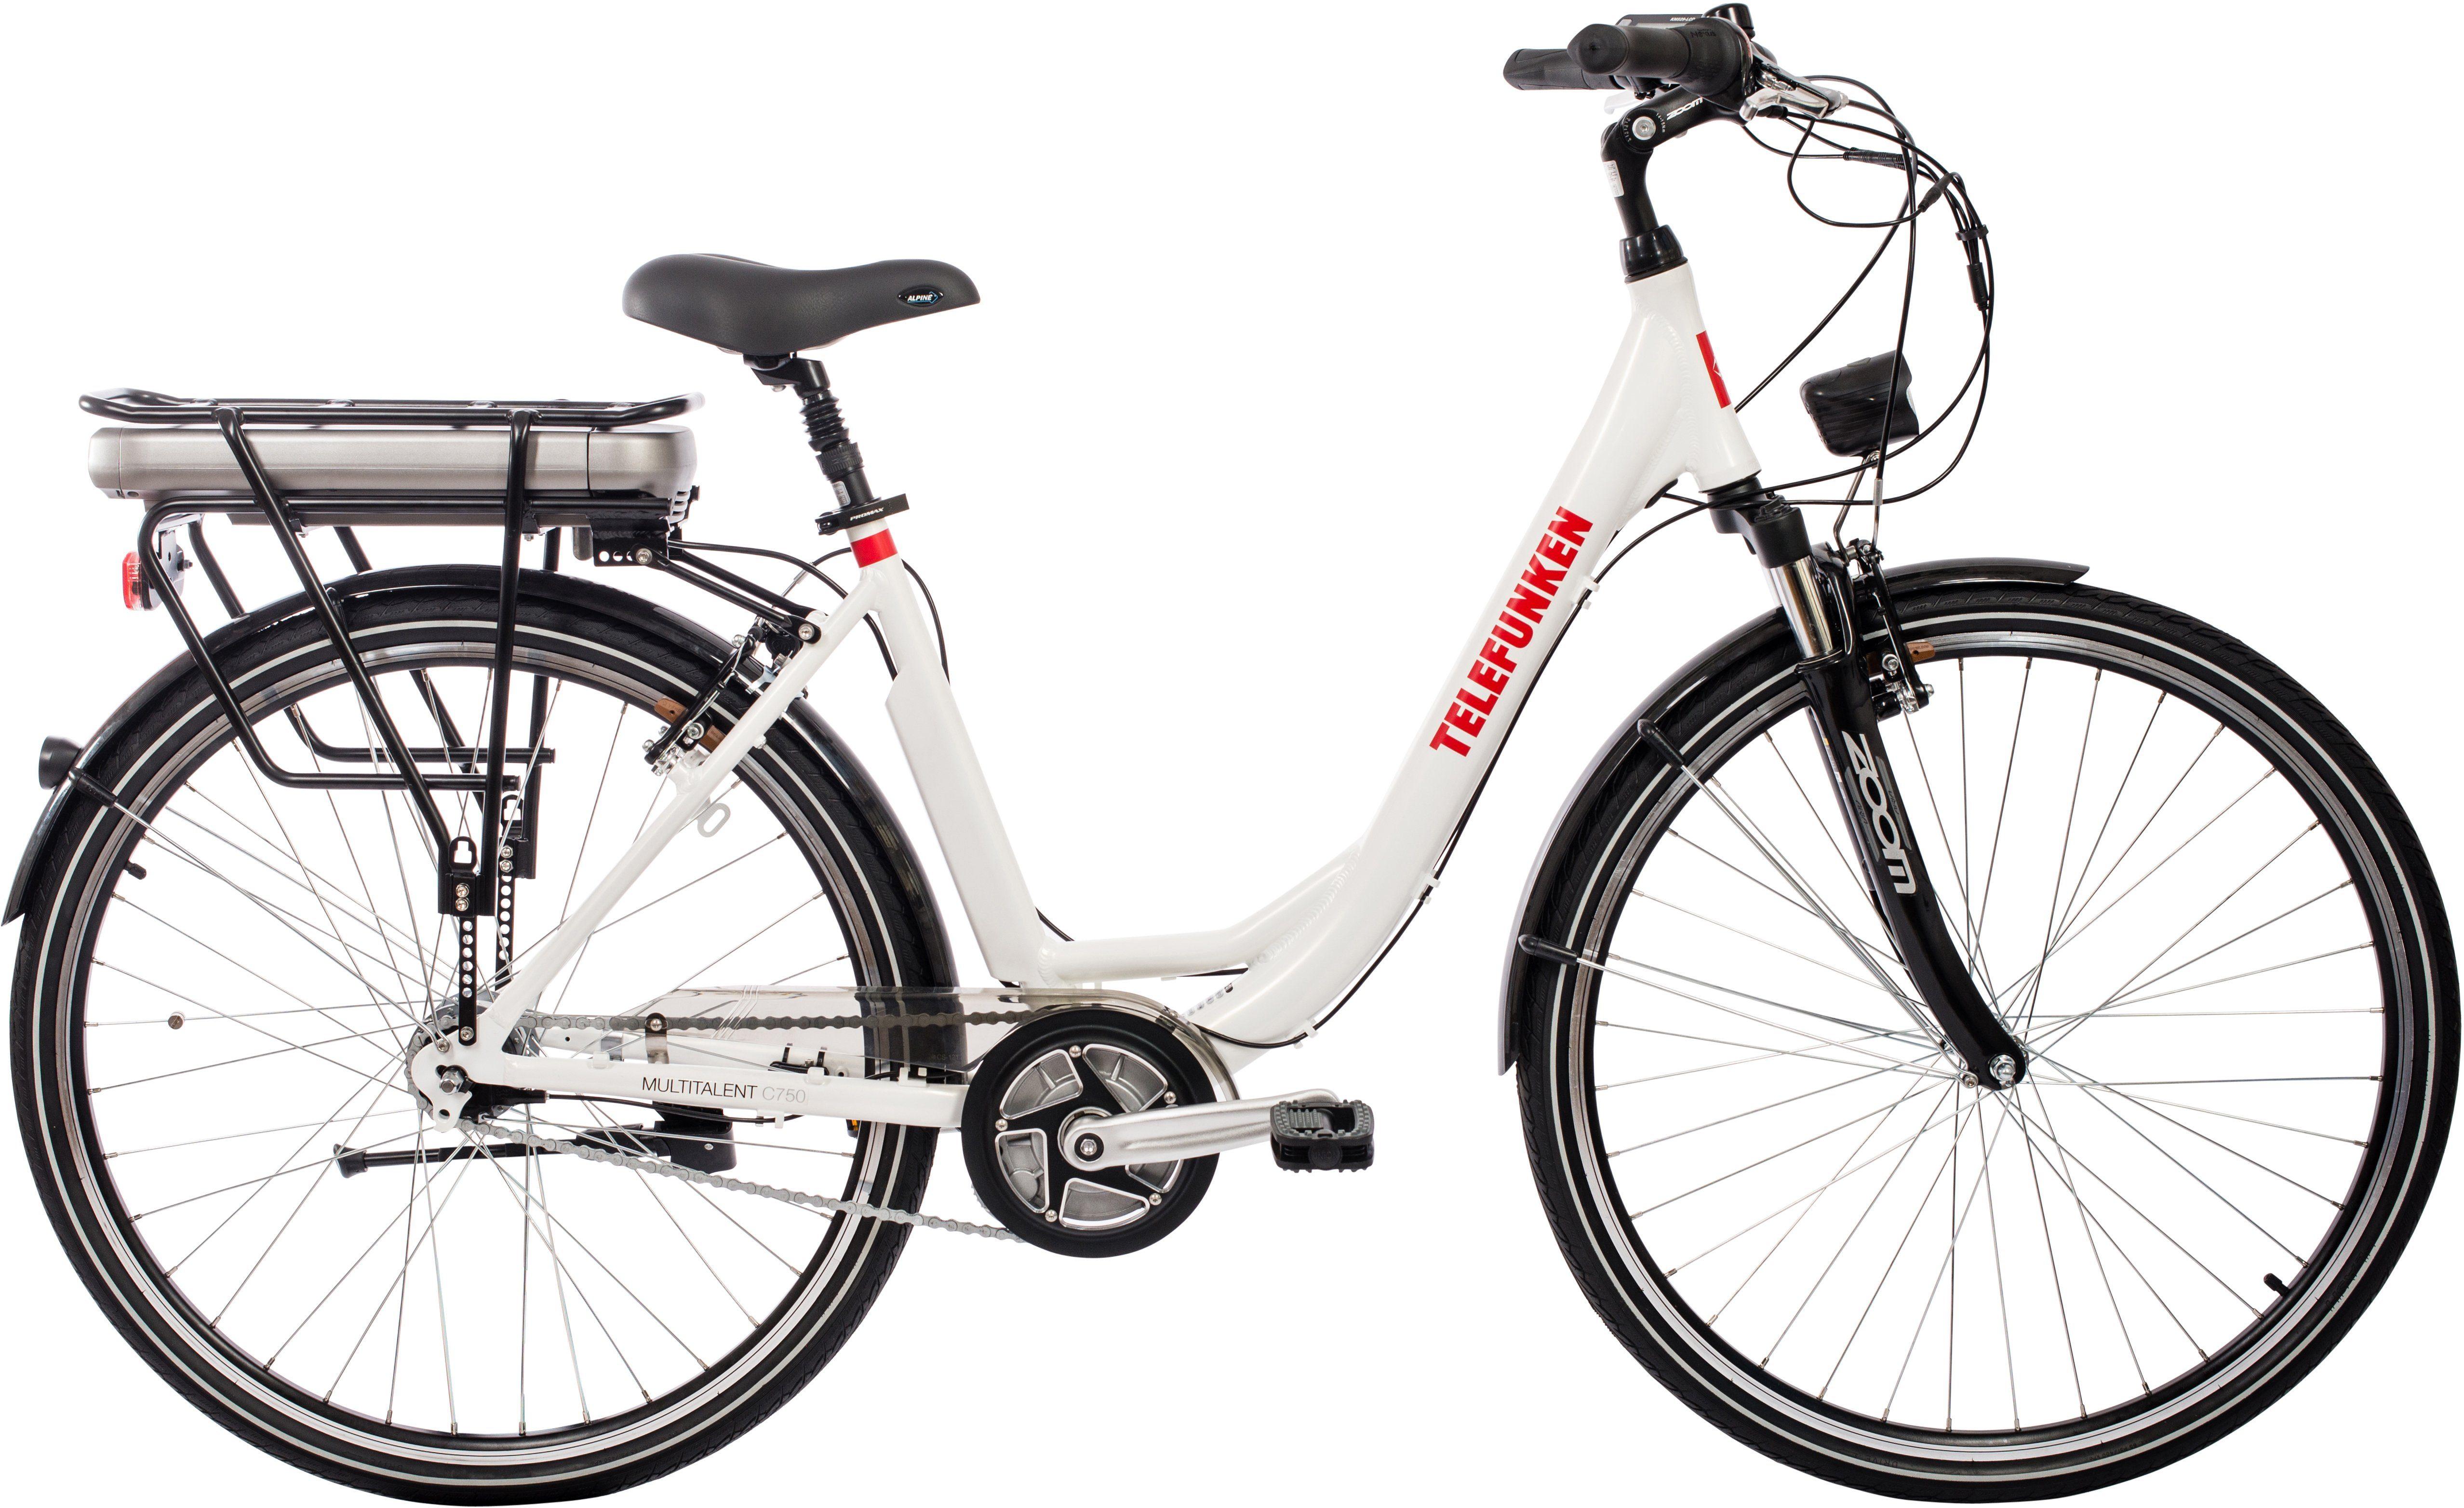 Telefunken Damen Alu City E-Bike, 28 Zoll, 7-Gang Shimano Nexus Nabenschaltung, »Multitalent C750«